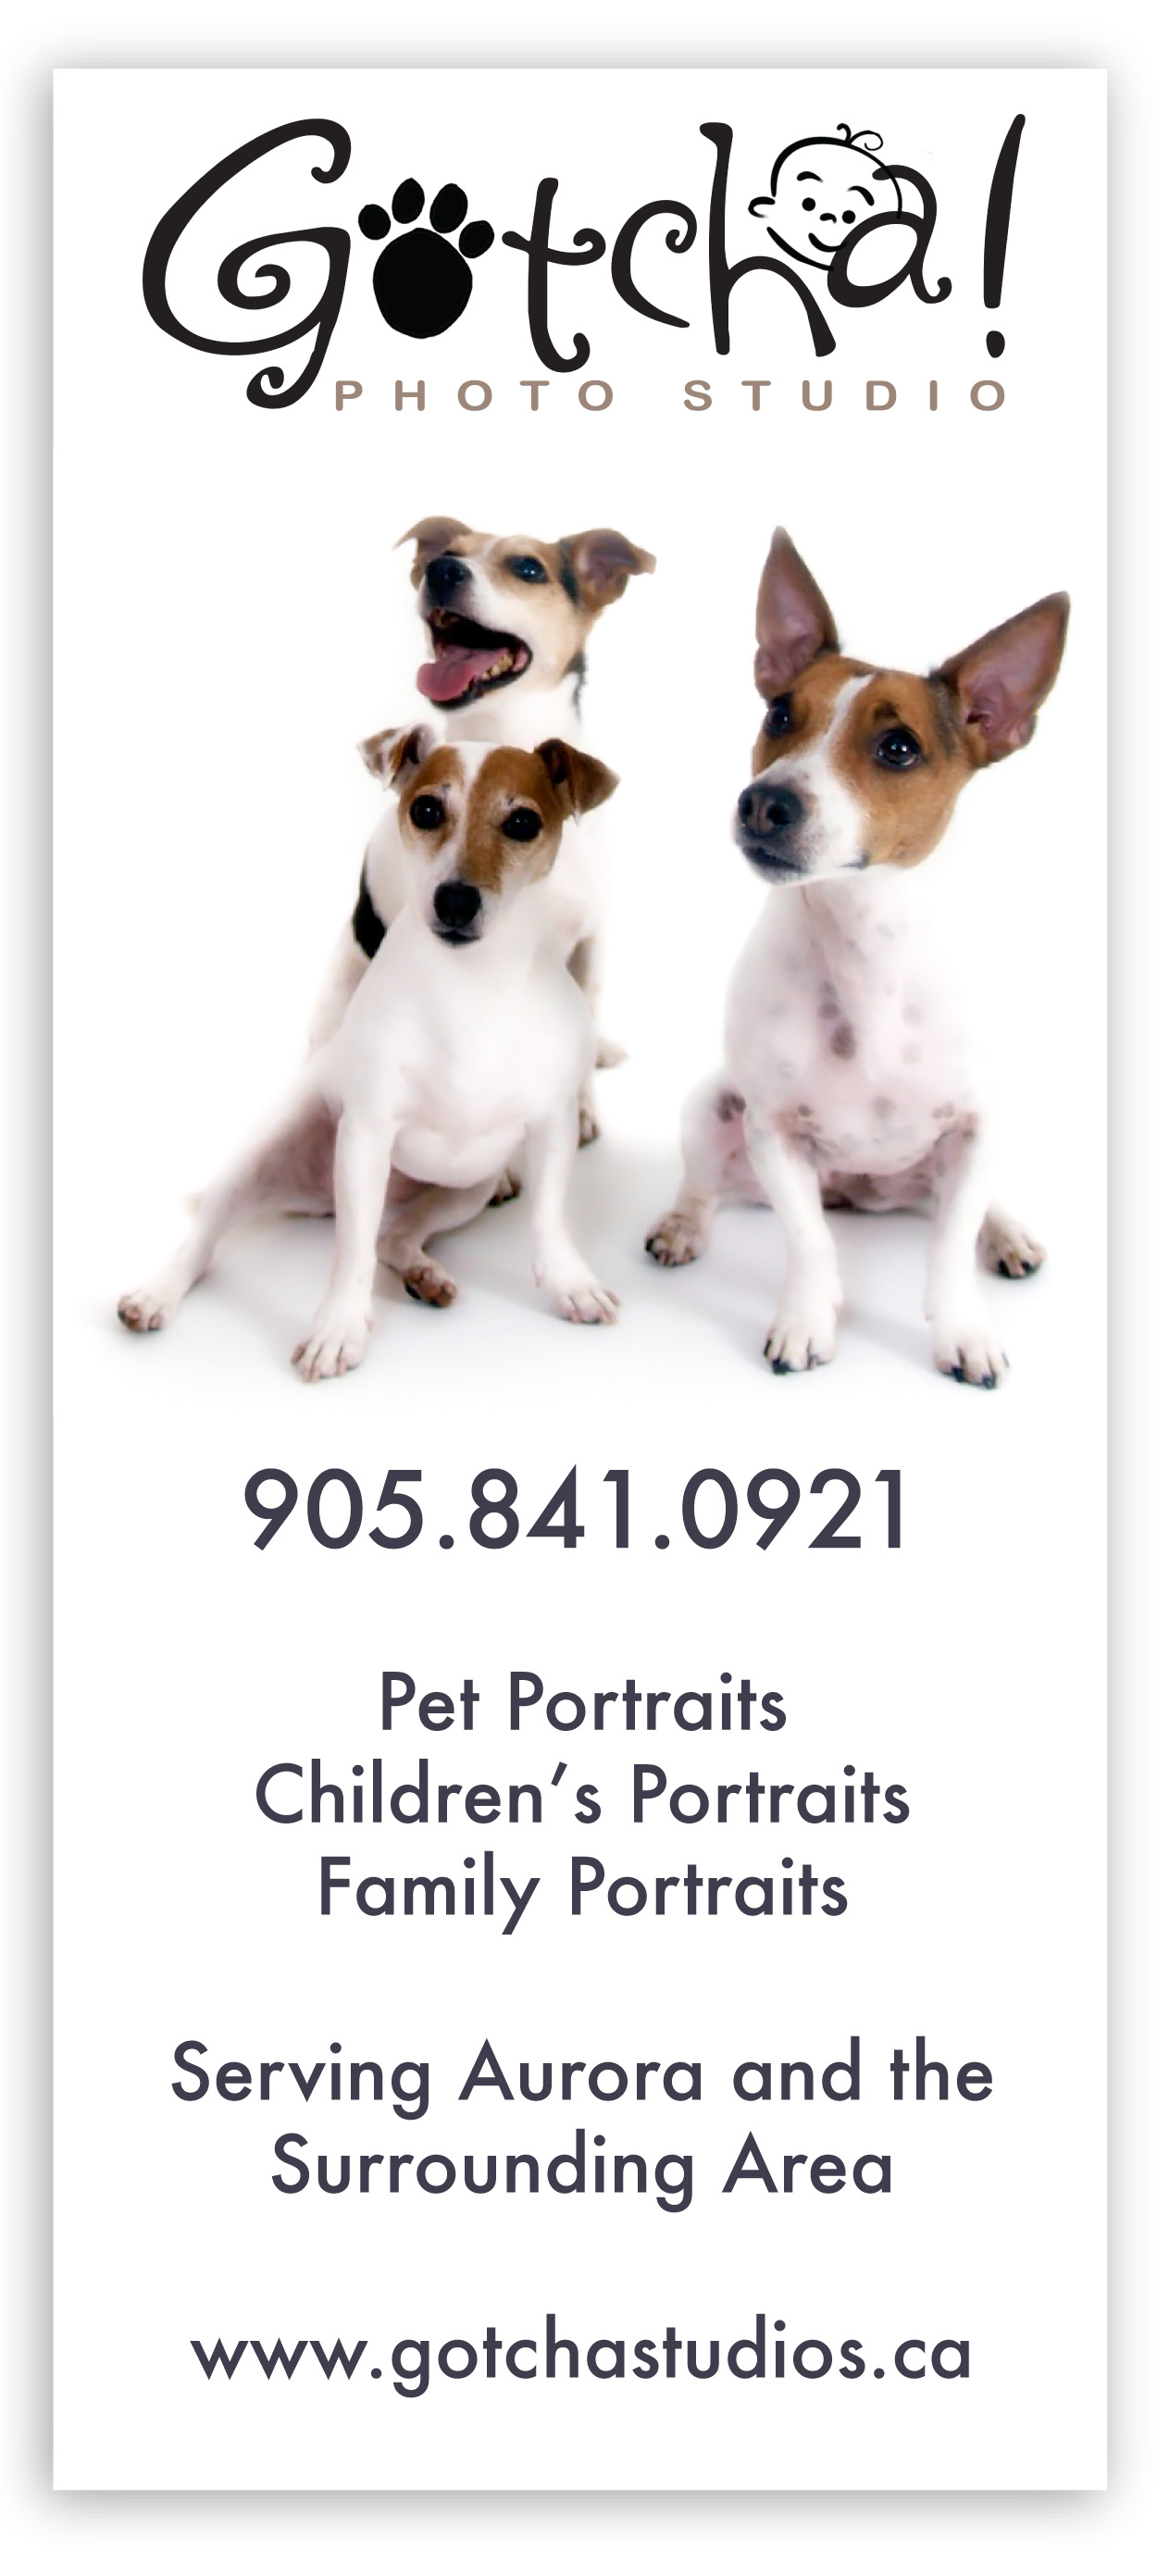 Pet Friendly Gotcha! Photo Studio